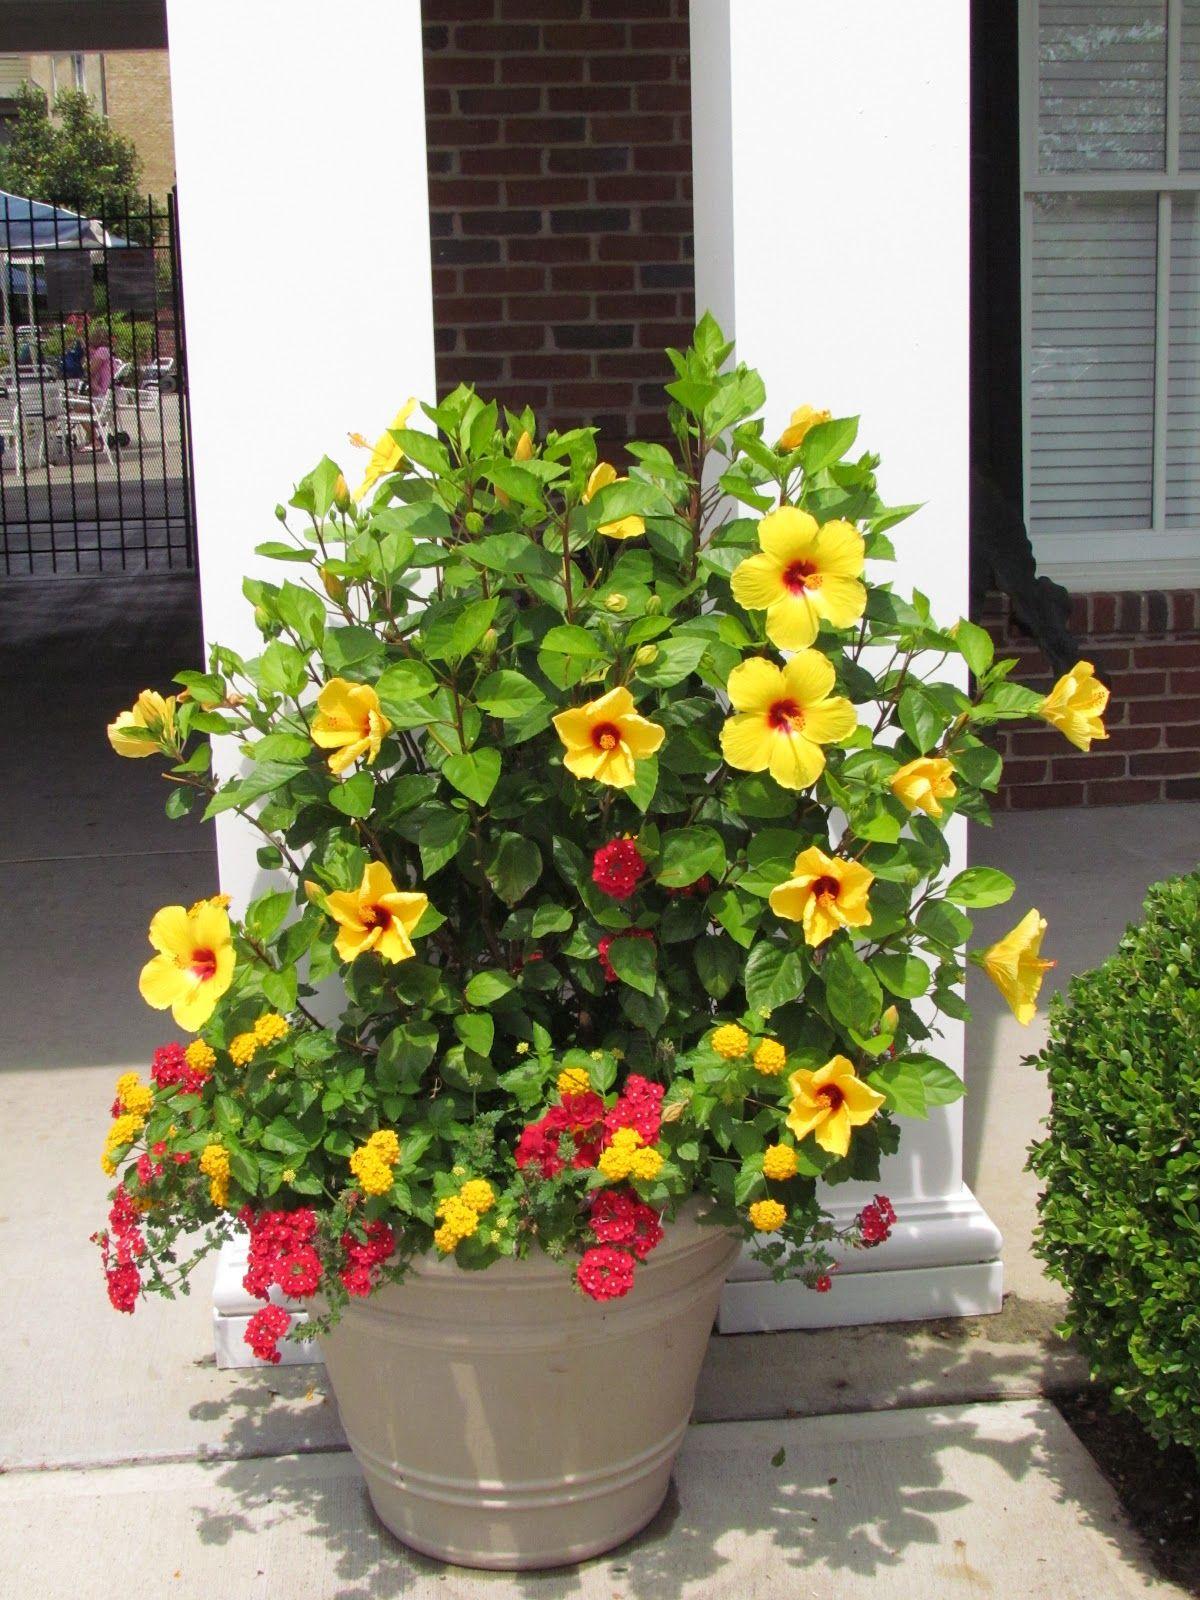 Front porch container gardening ideas - Find This Pin And More On Garden Container Gardening